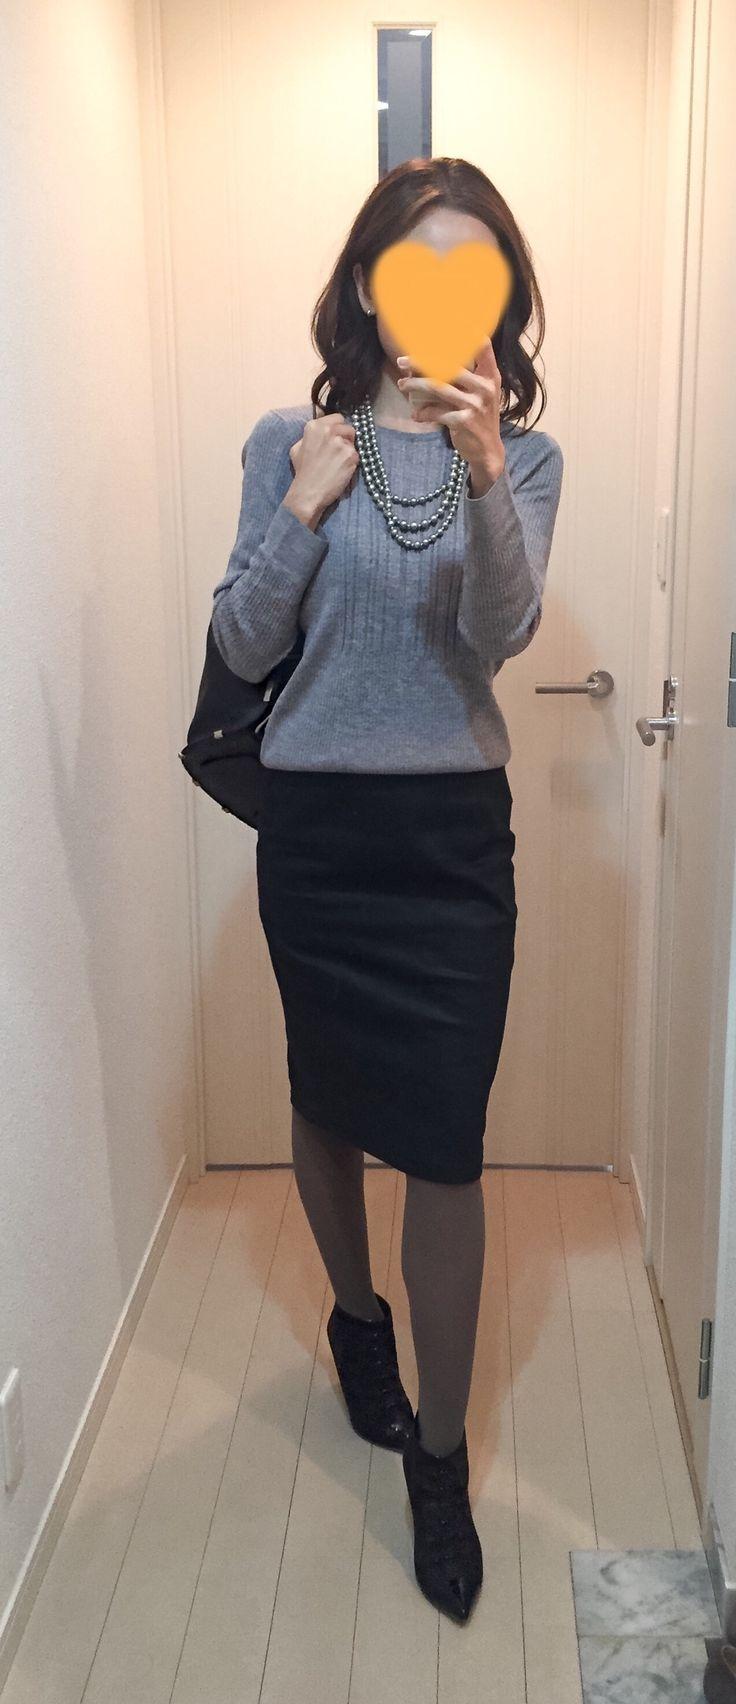 Grey sweater: Des Pres, Faux leather skirt: Sisley, Bag: ZAC Zac Posen, Boots: Fabio Rusconi